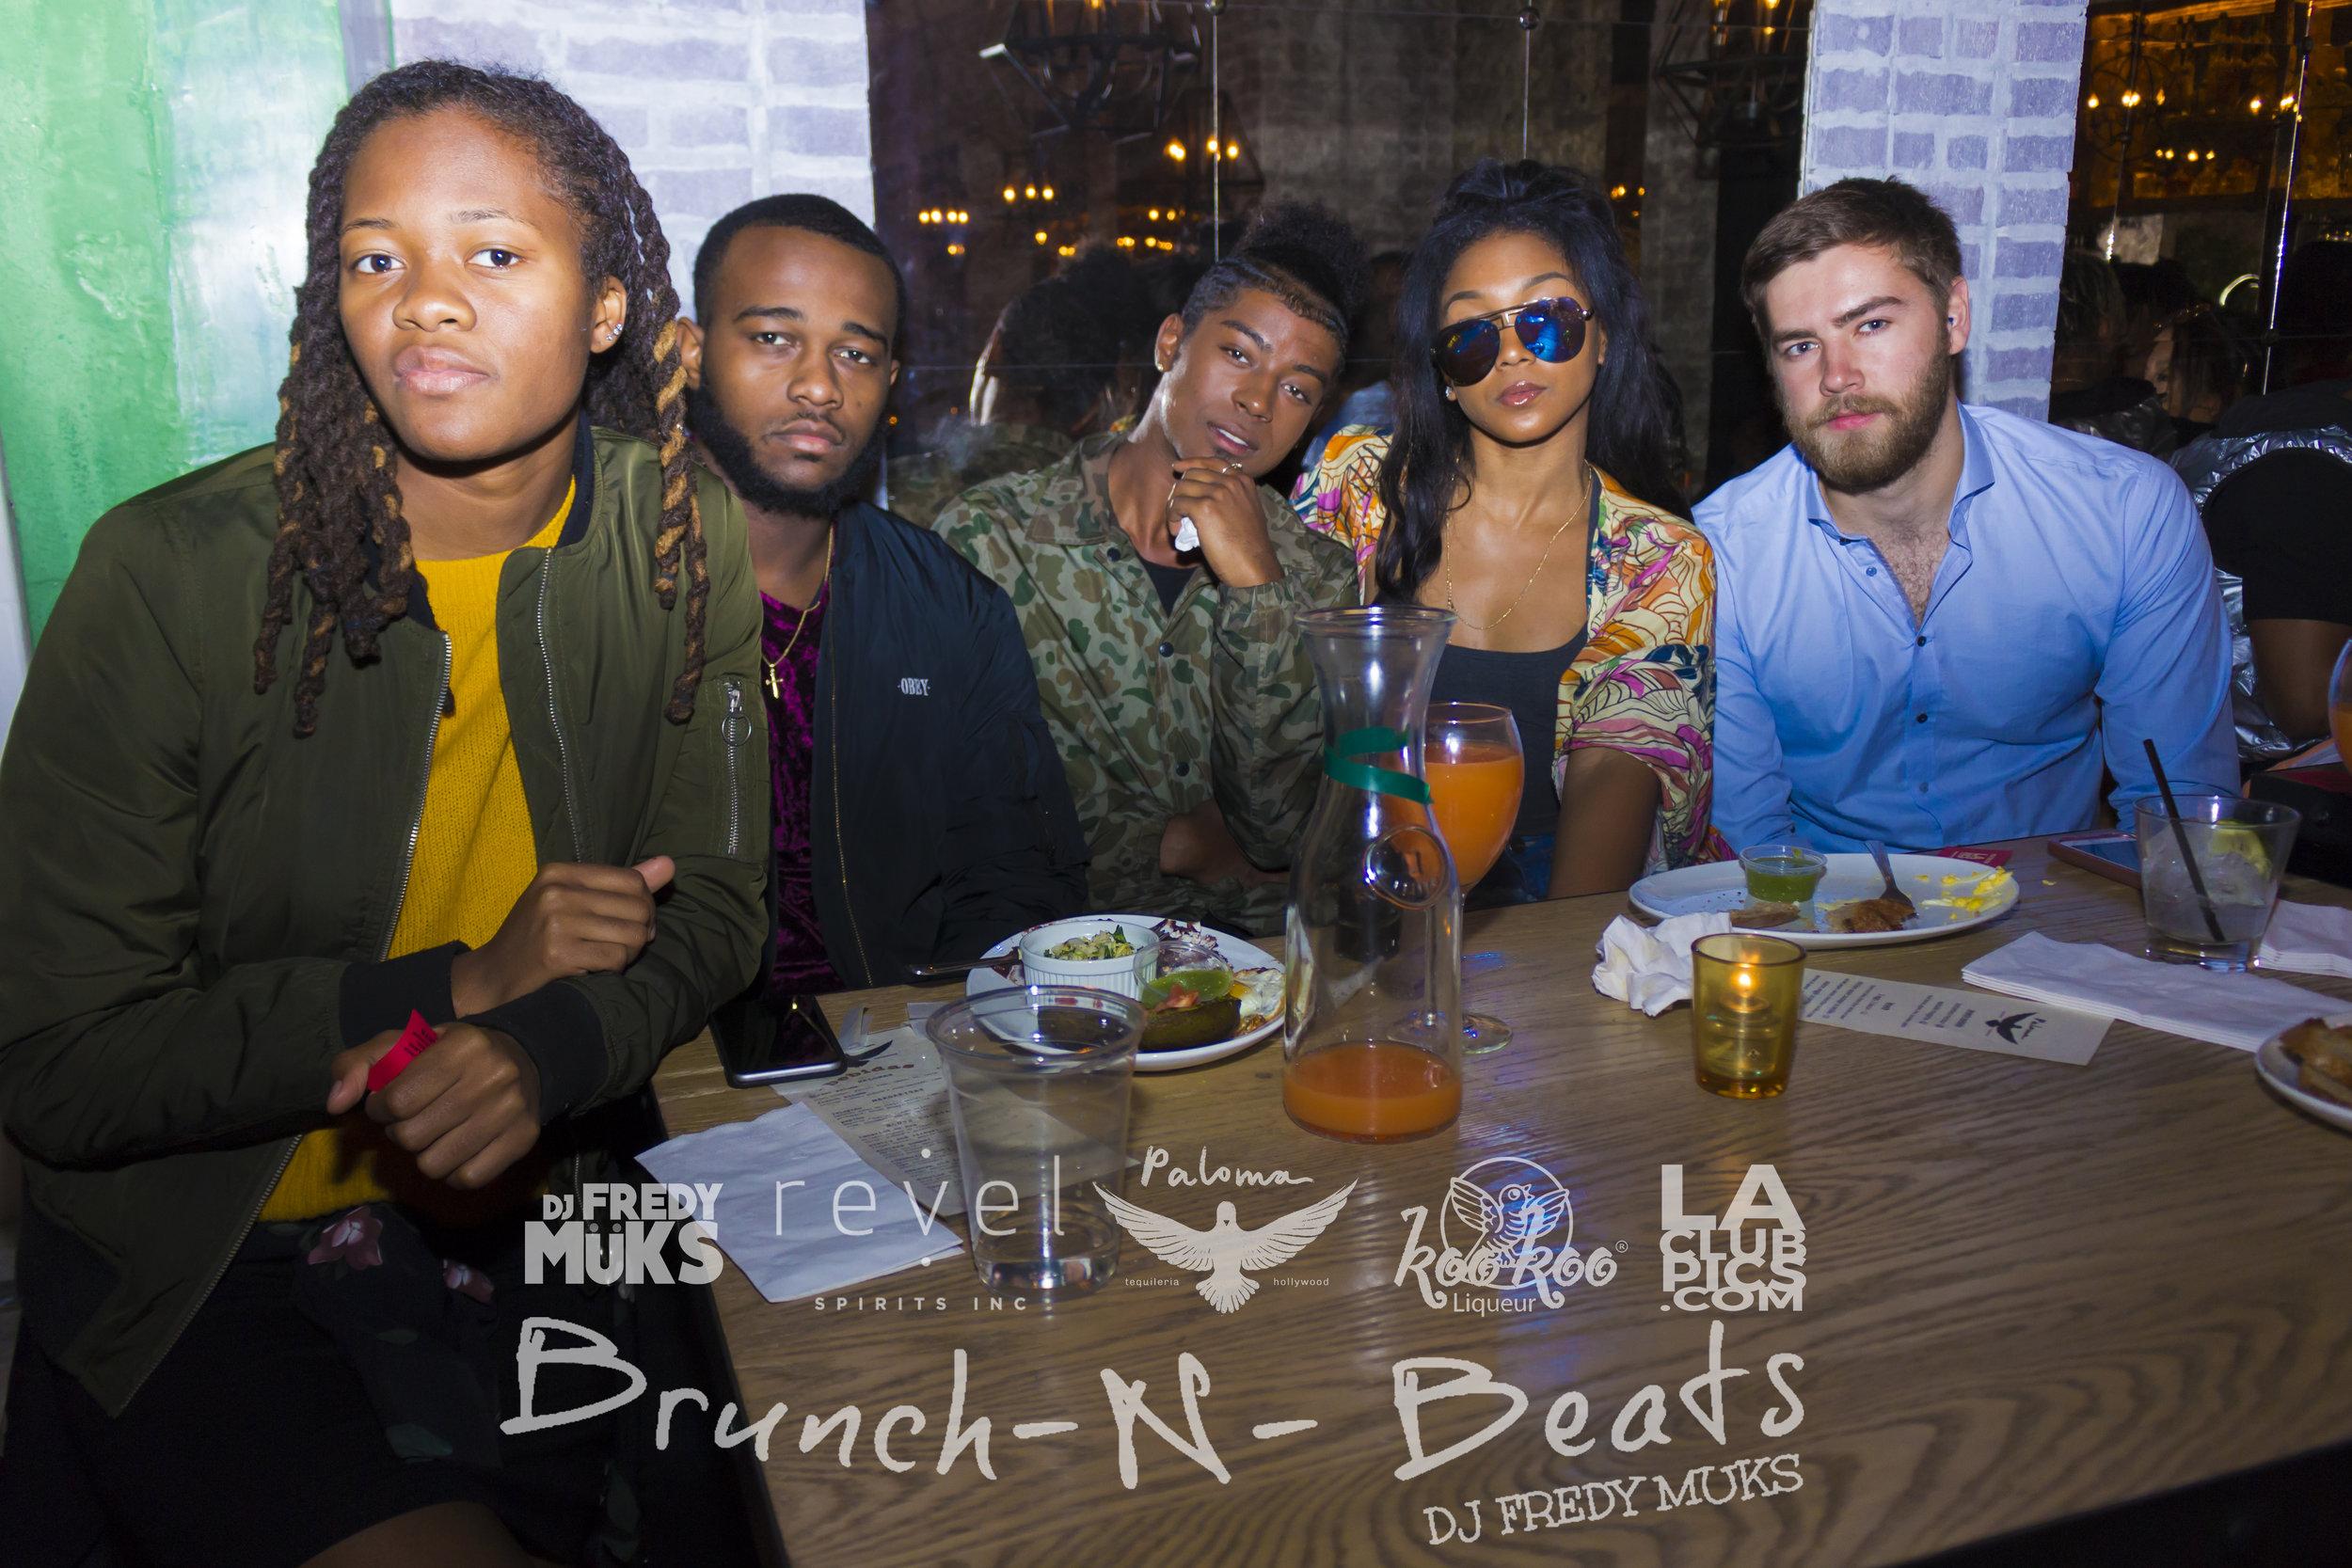 Brunch-N-Beats - Paloma Hollywood - 02-25-18_105.jpg